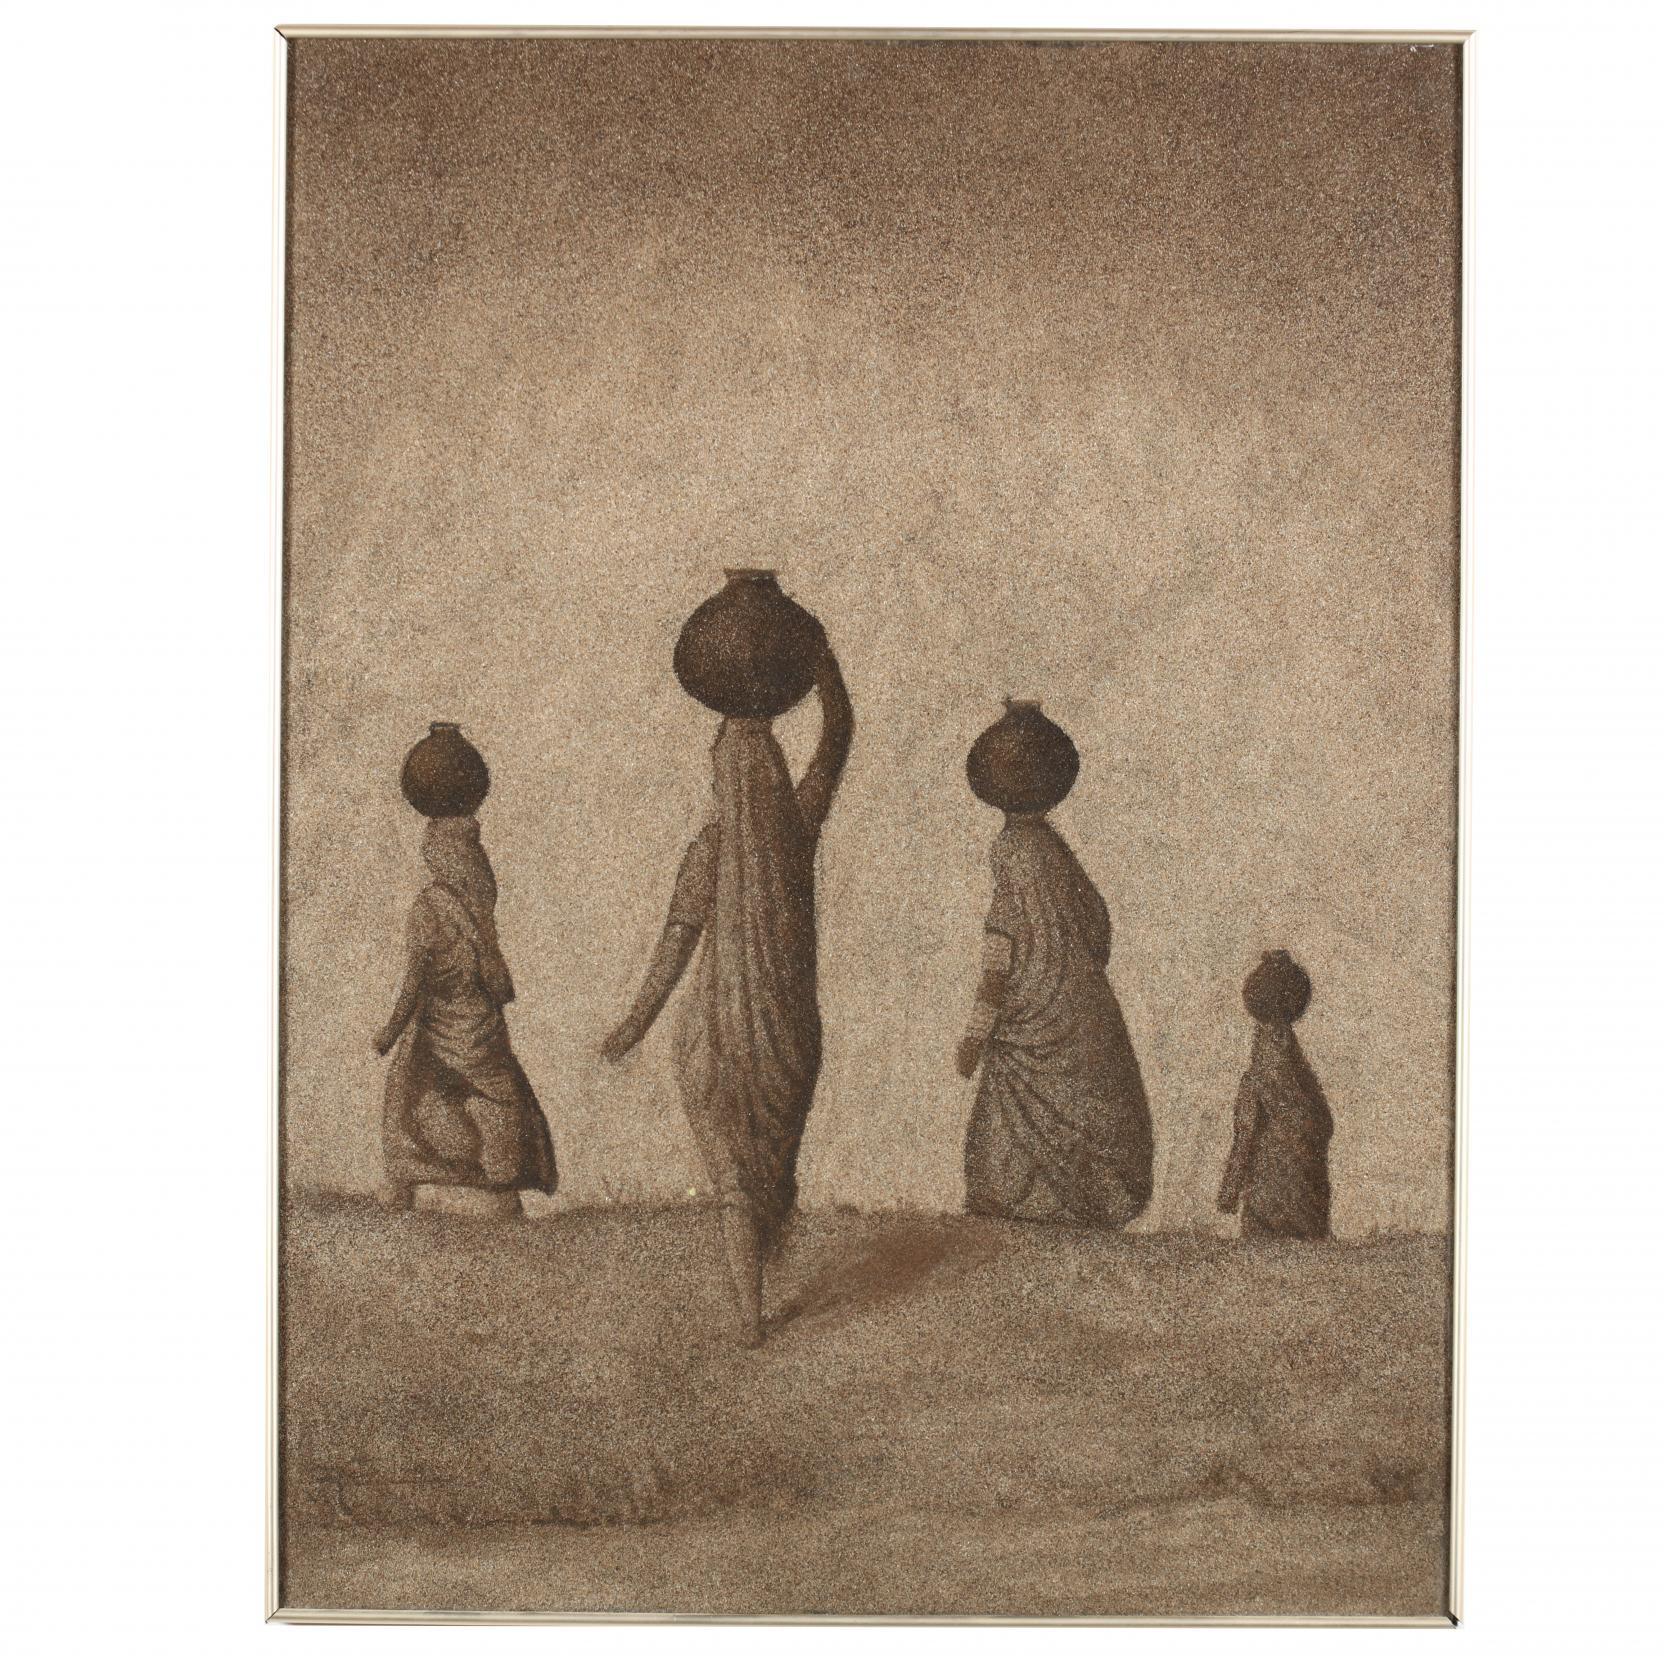 vintage-middle-eastern-sand-painting